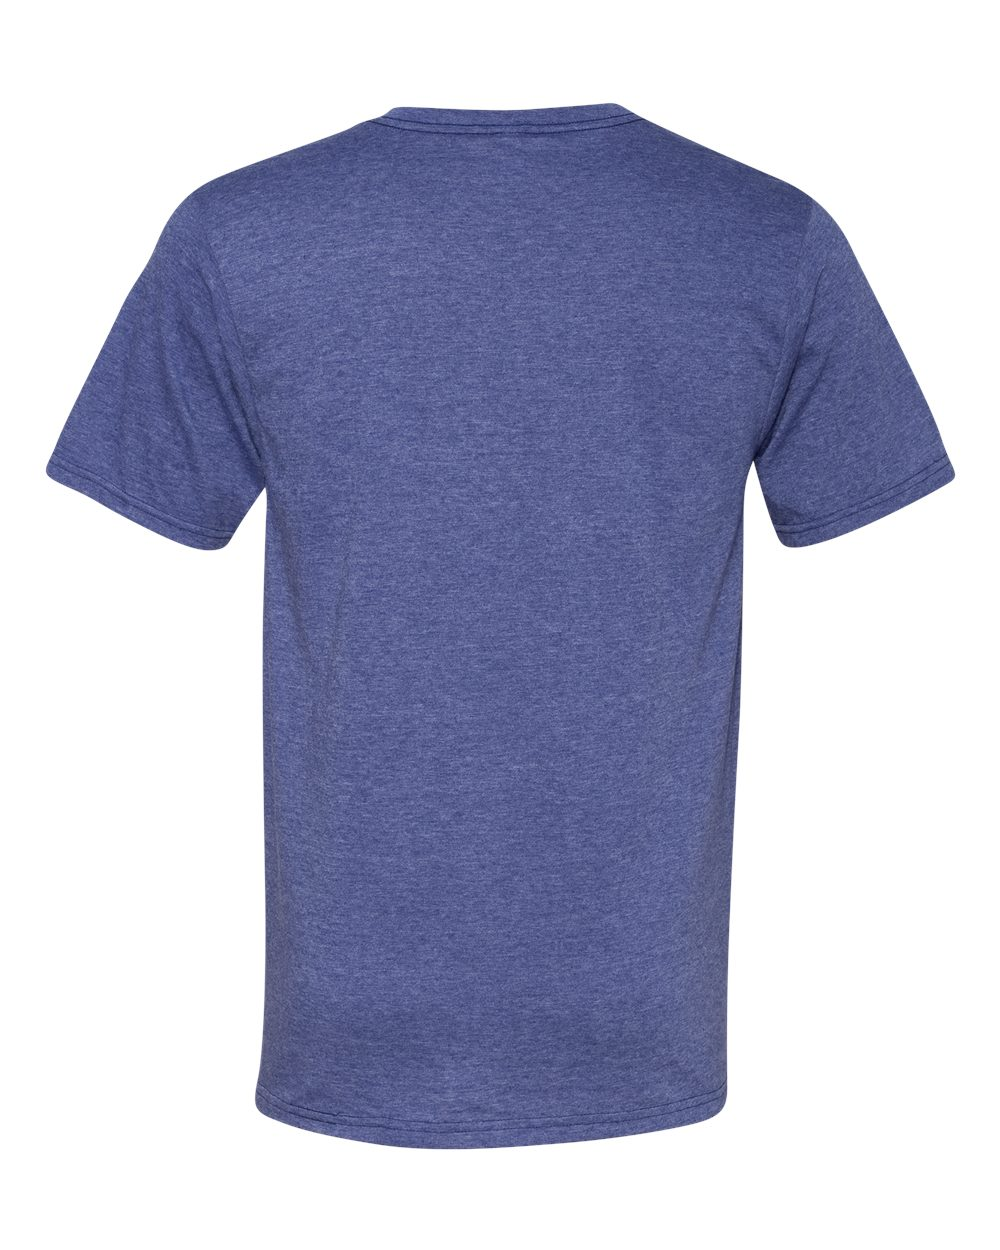 Anvil-Men-039-s-Lightweight-V-Neck-T-Shirt-982-S-3XL thumbnail 13